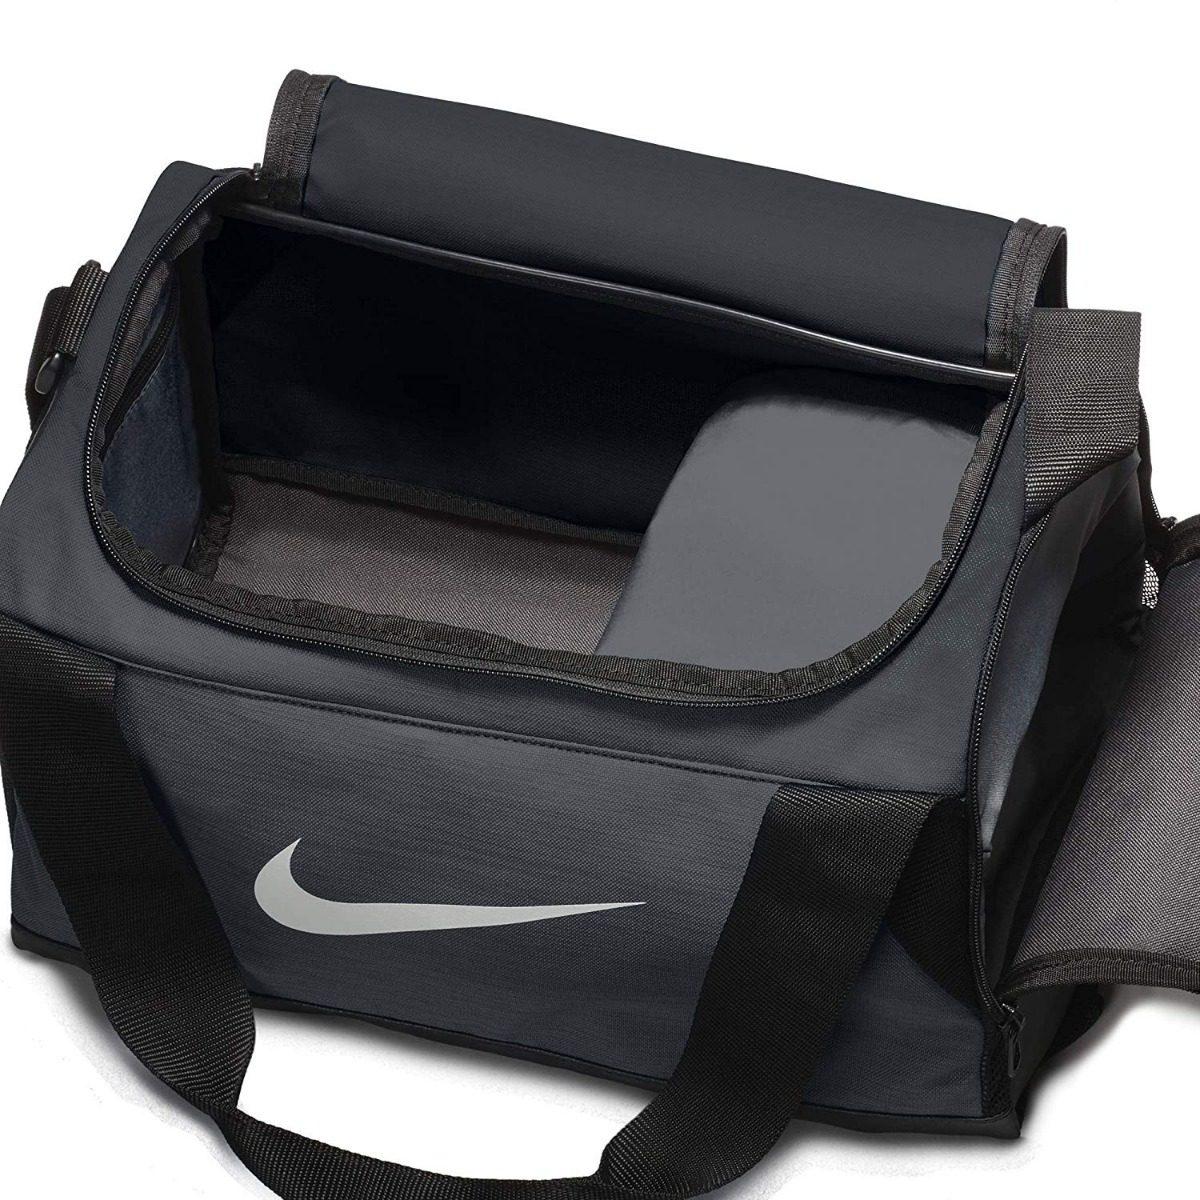 dedfa58e581 ... official photos cf8a8 c460c bolsa nike brasilia x-small training duffel  bag.